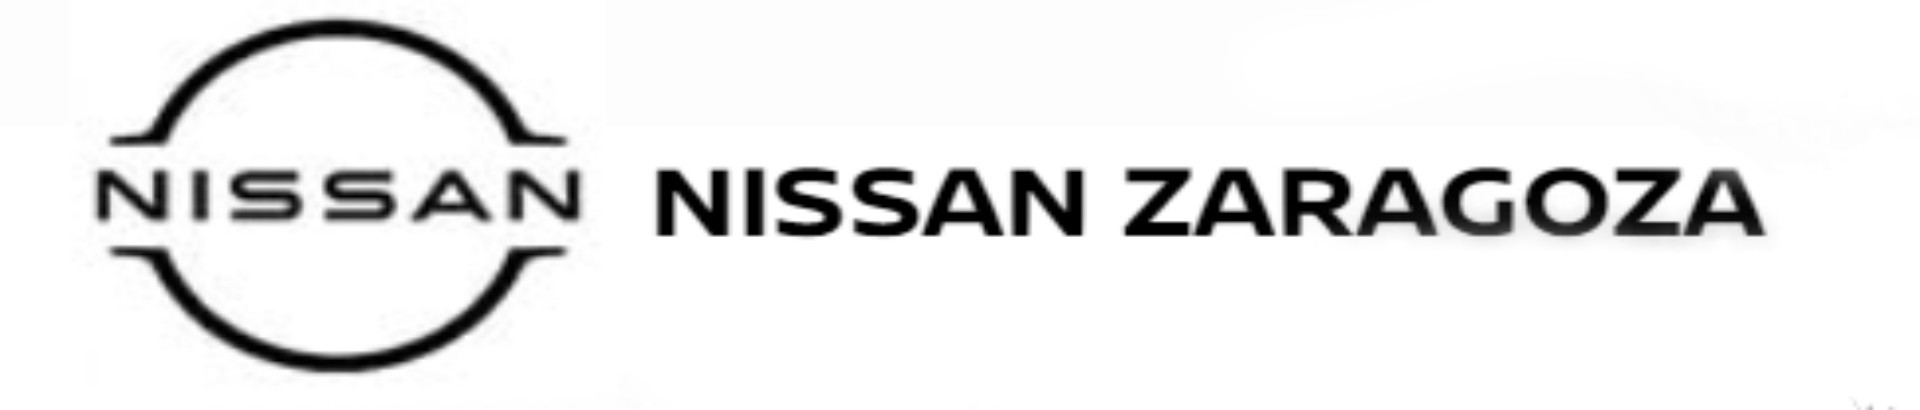 Nissan Zaragoza